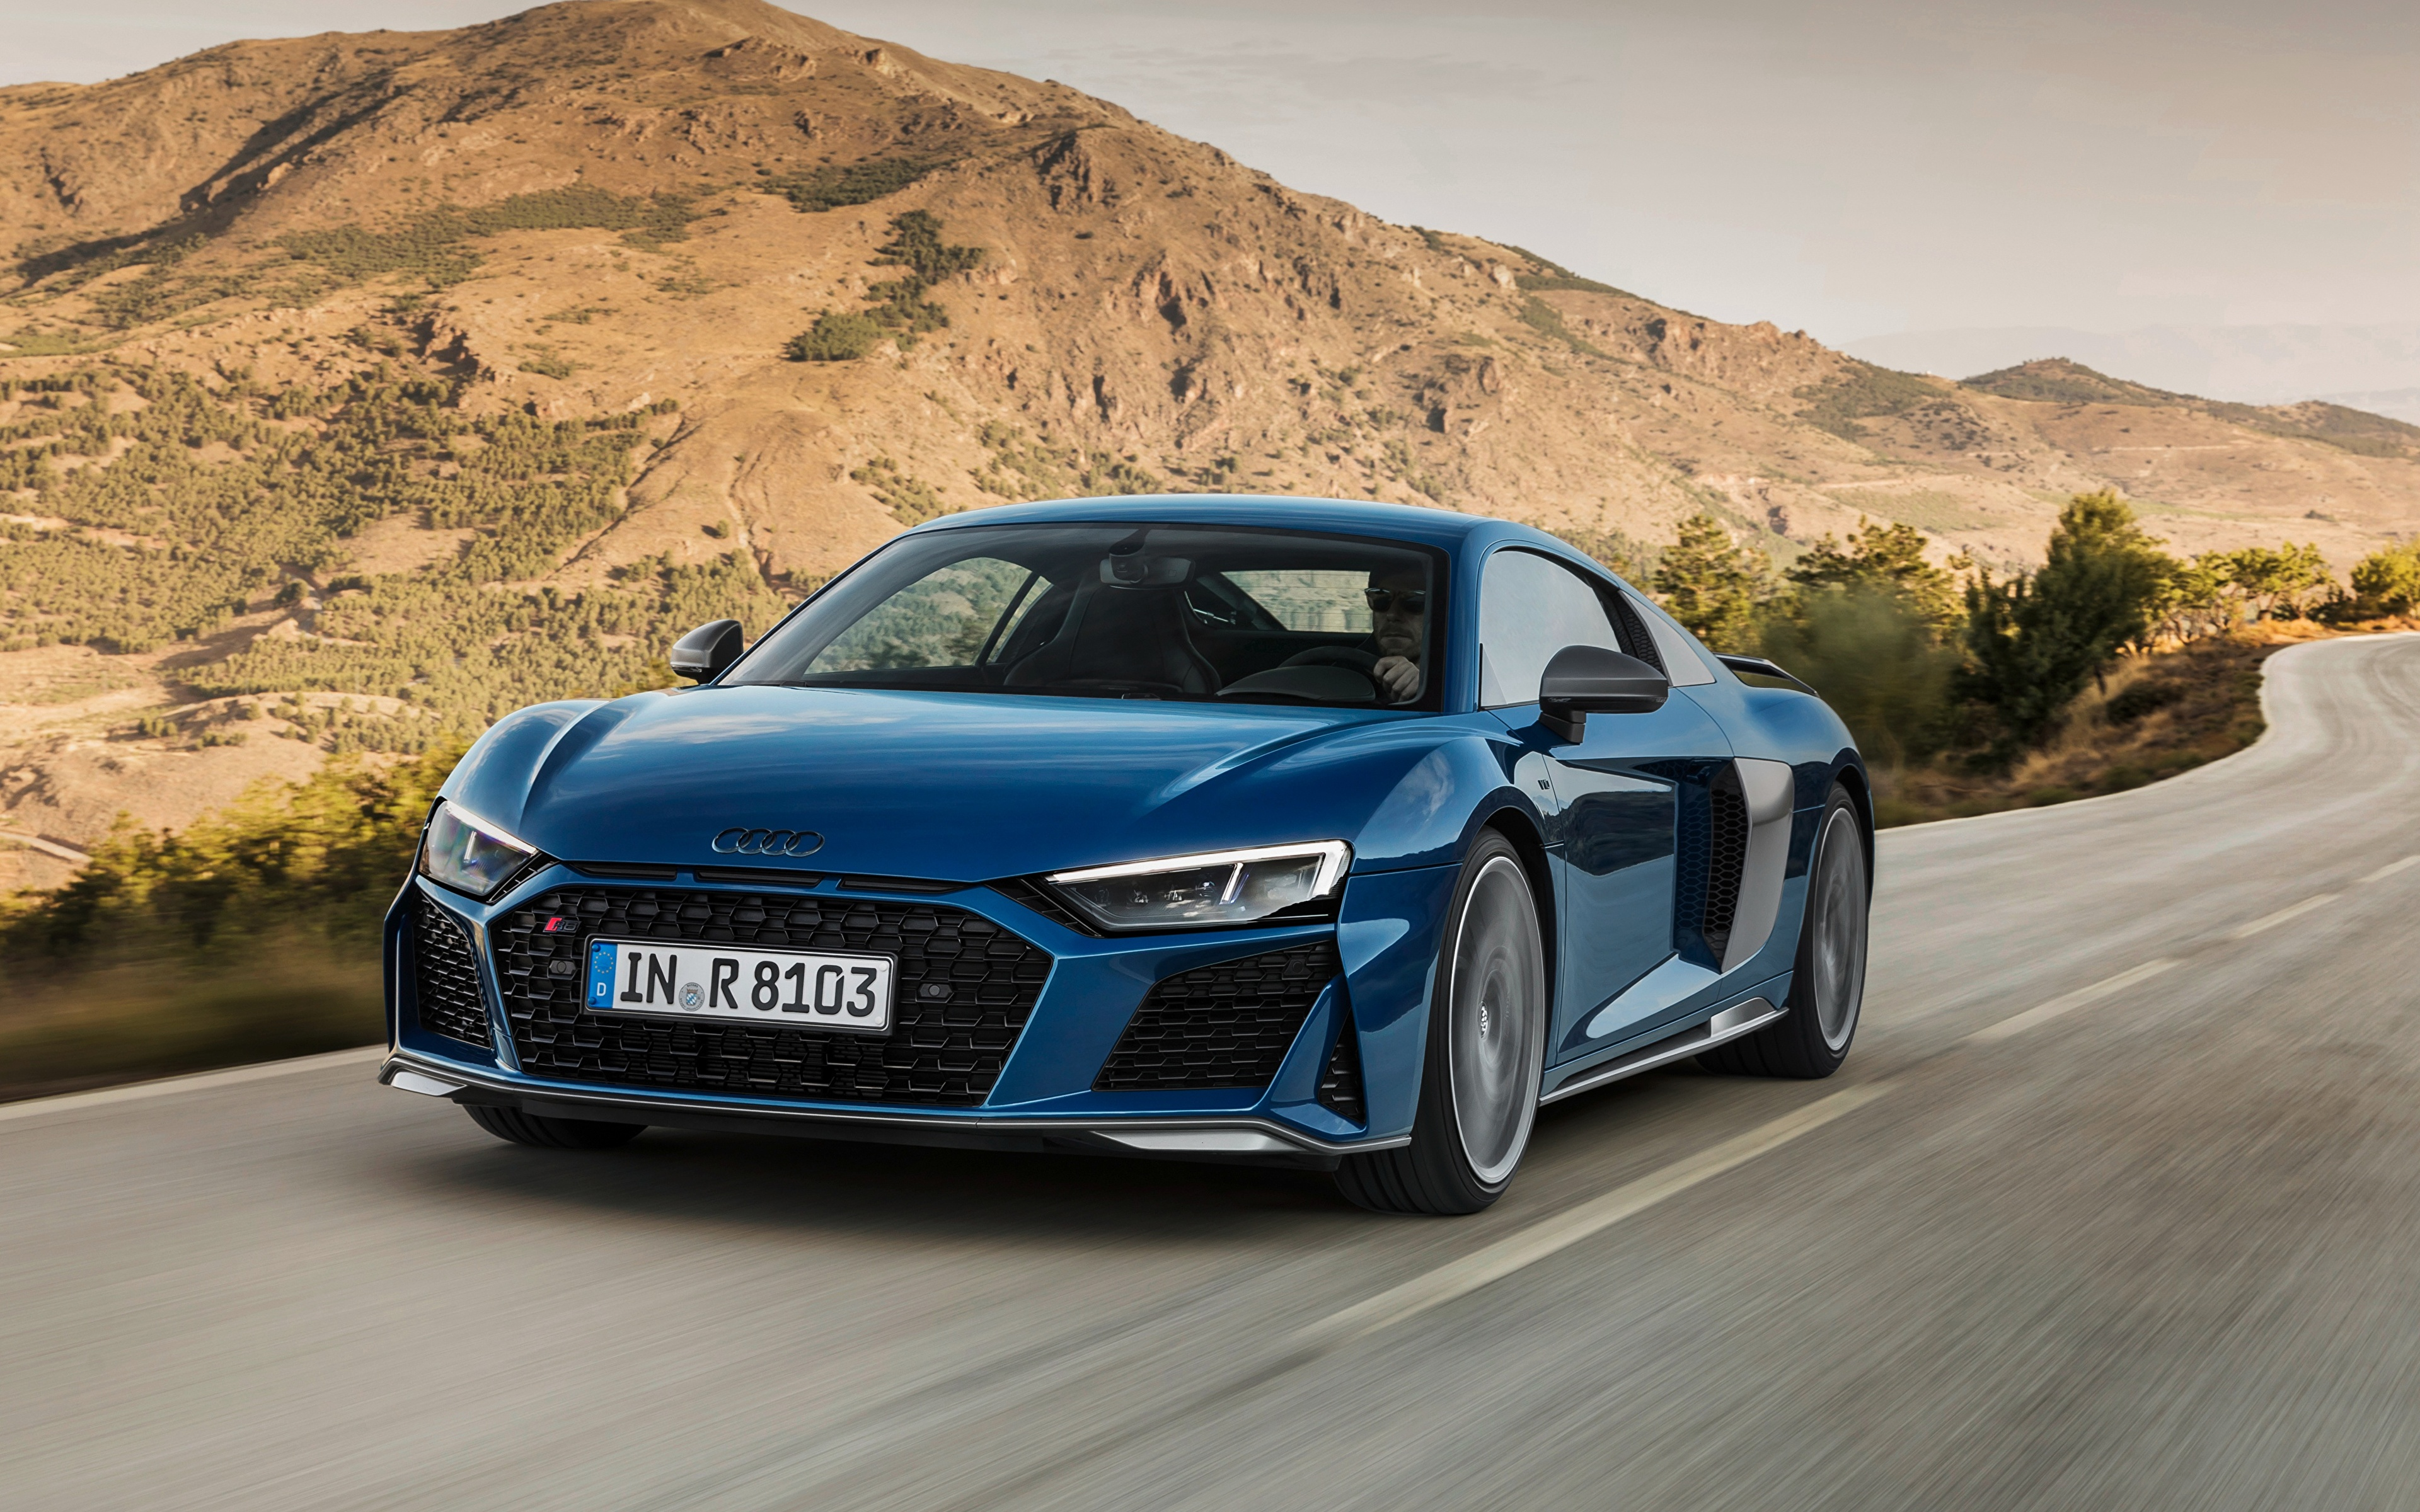 Picture Audi R8 2019 Blue riding Cars 3840x2400